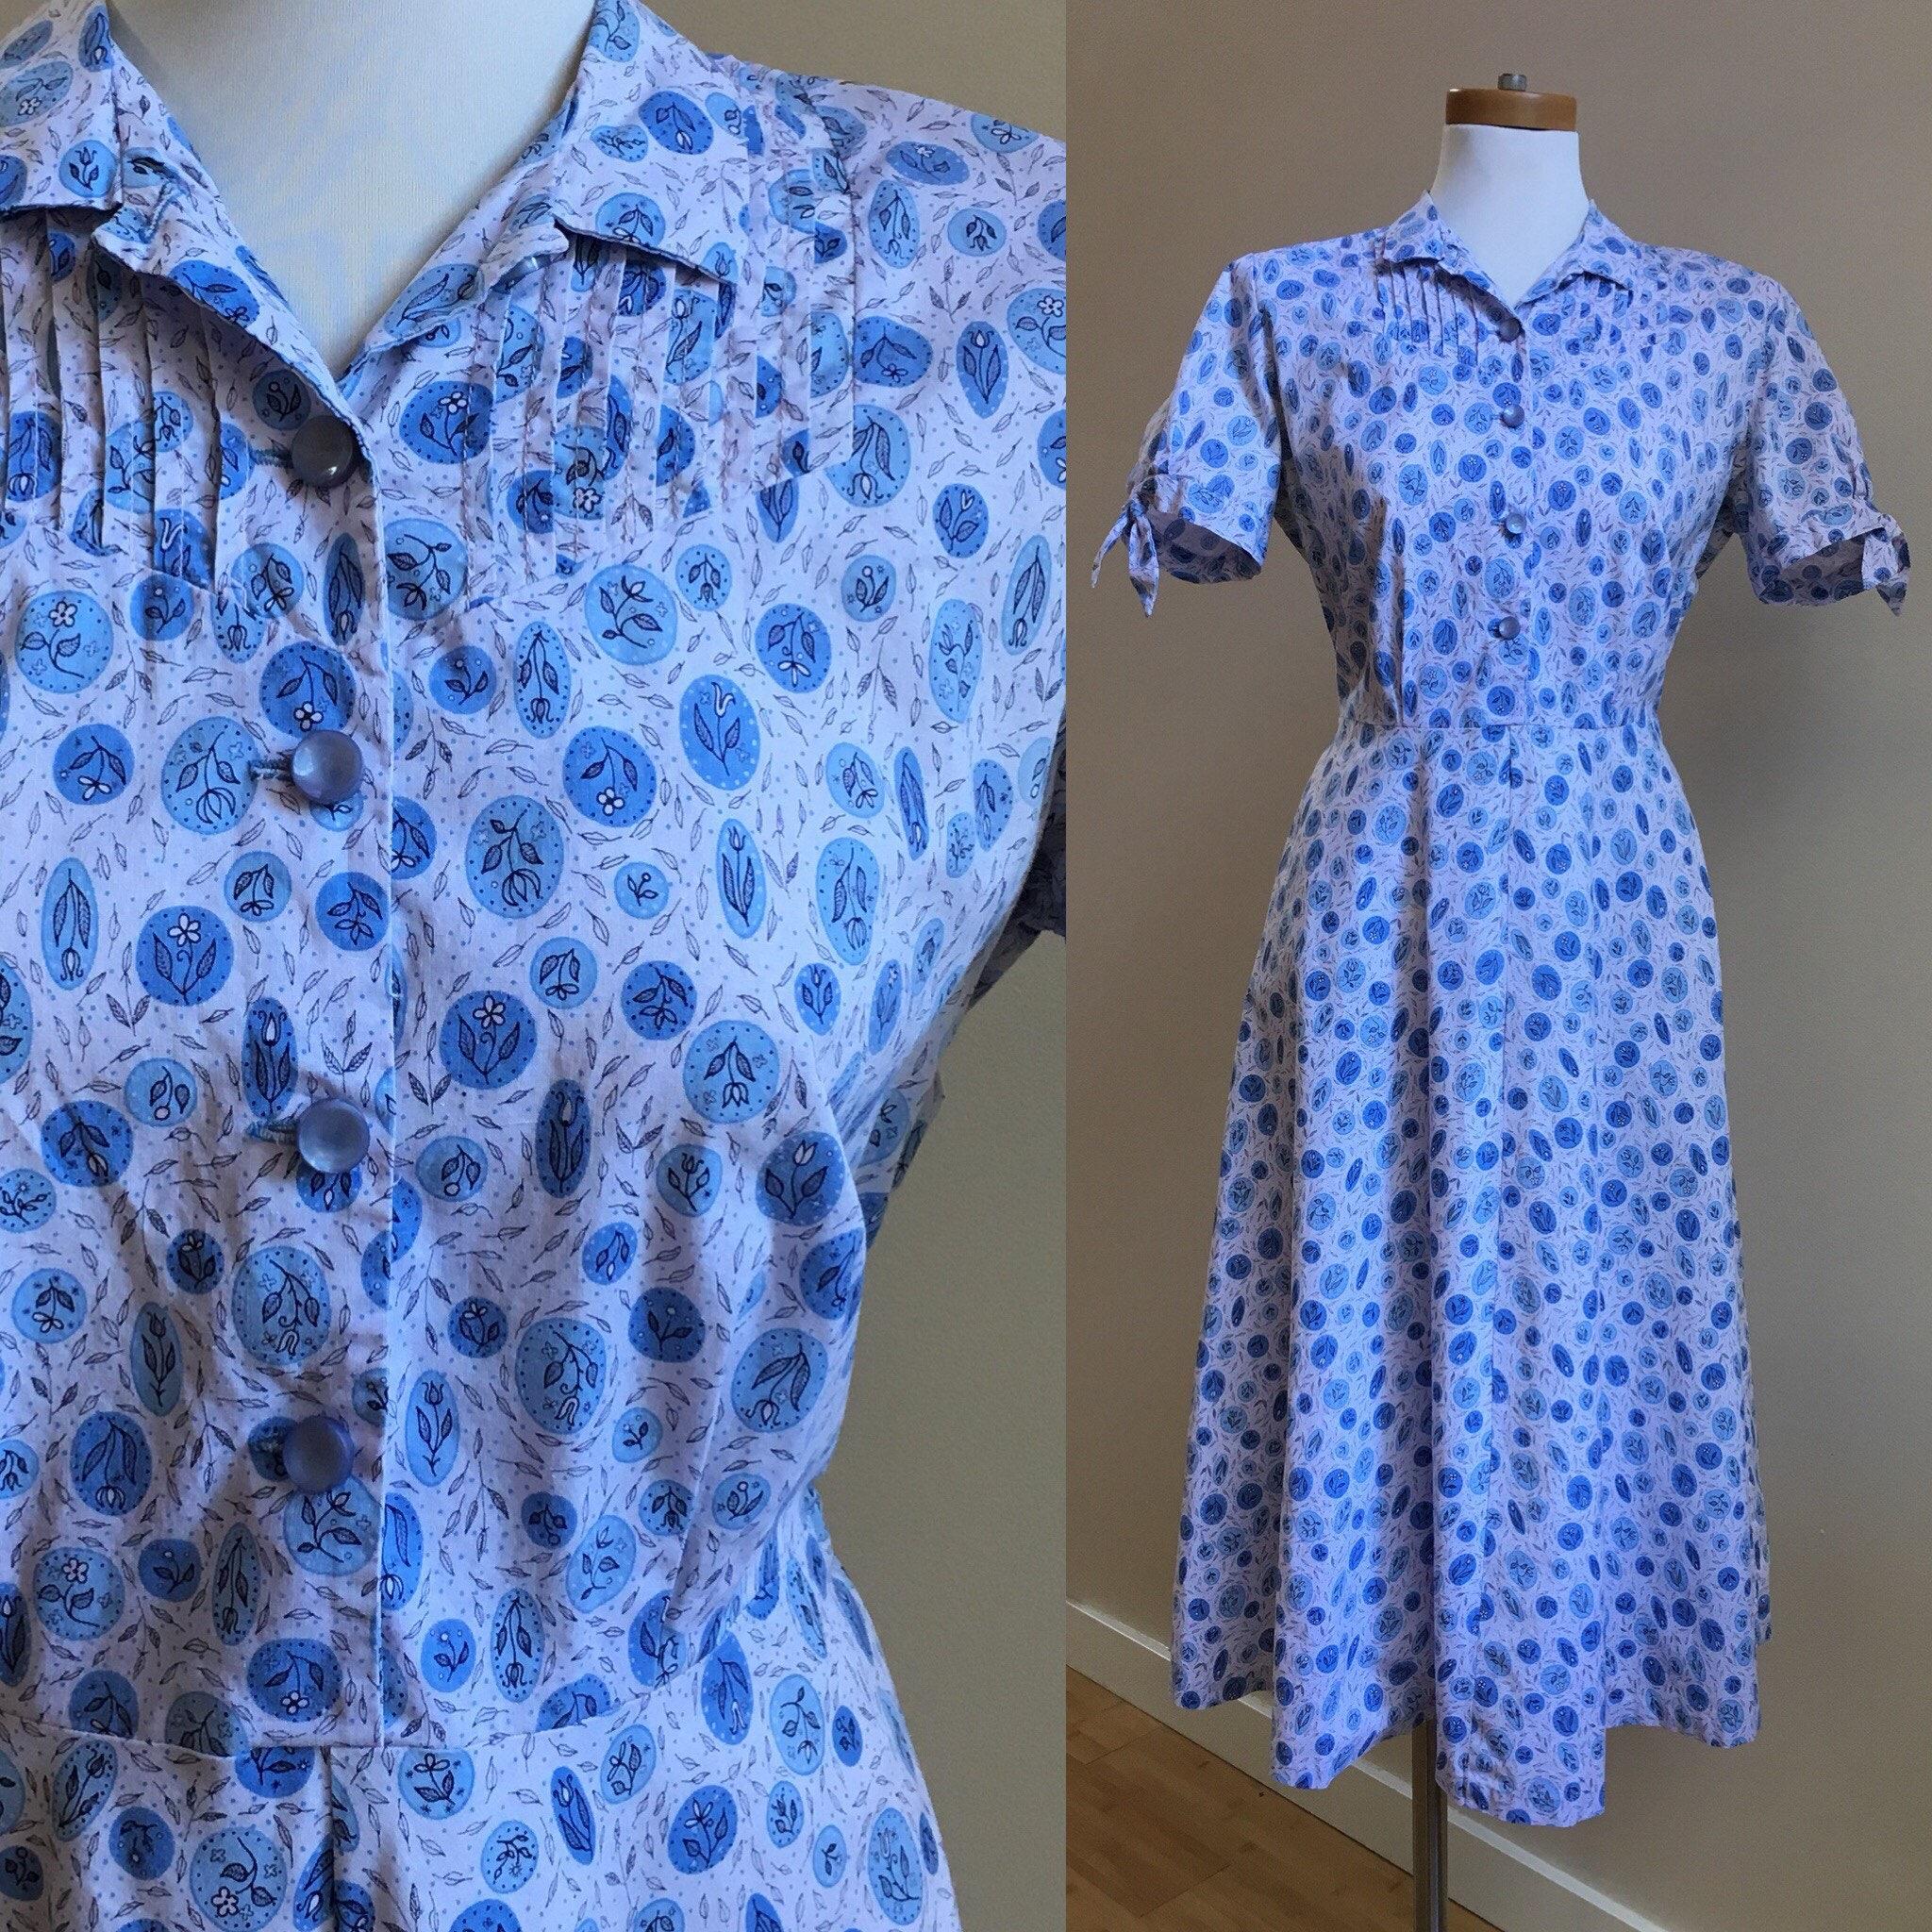 8544ead951 Vintage 1950s 50s 50's rockabilly short sleeve white blue floral novelty ...